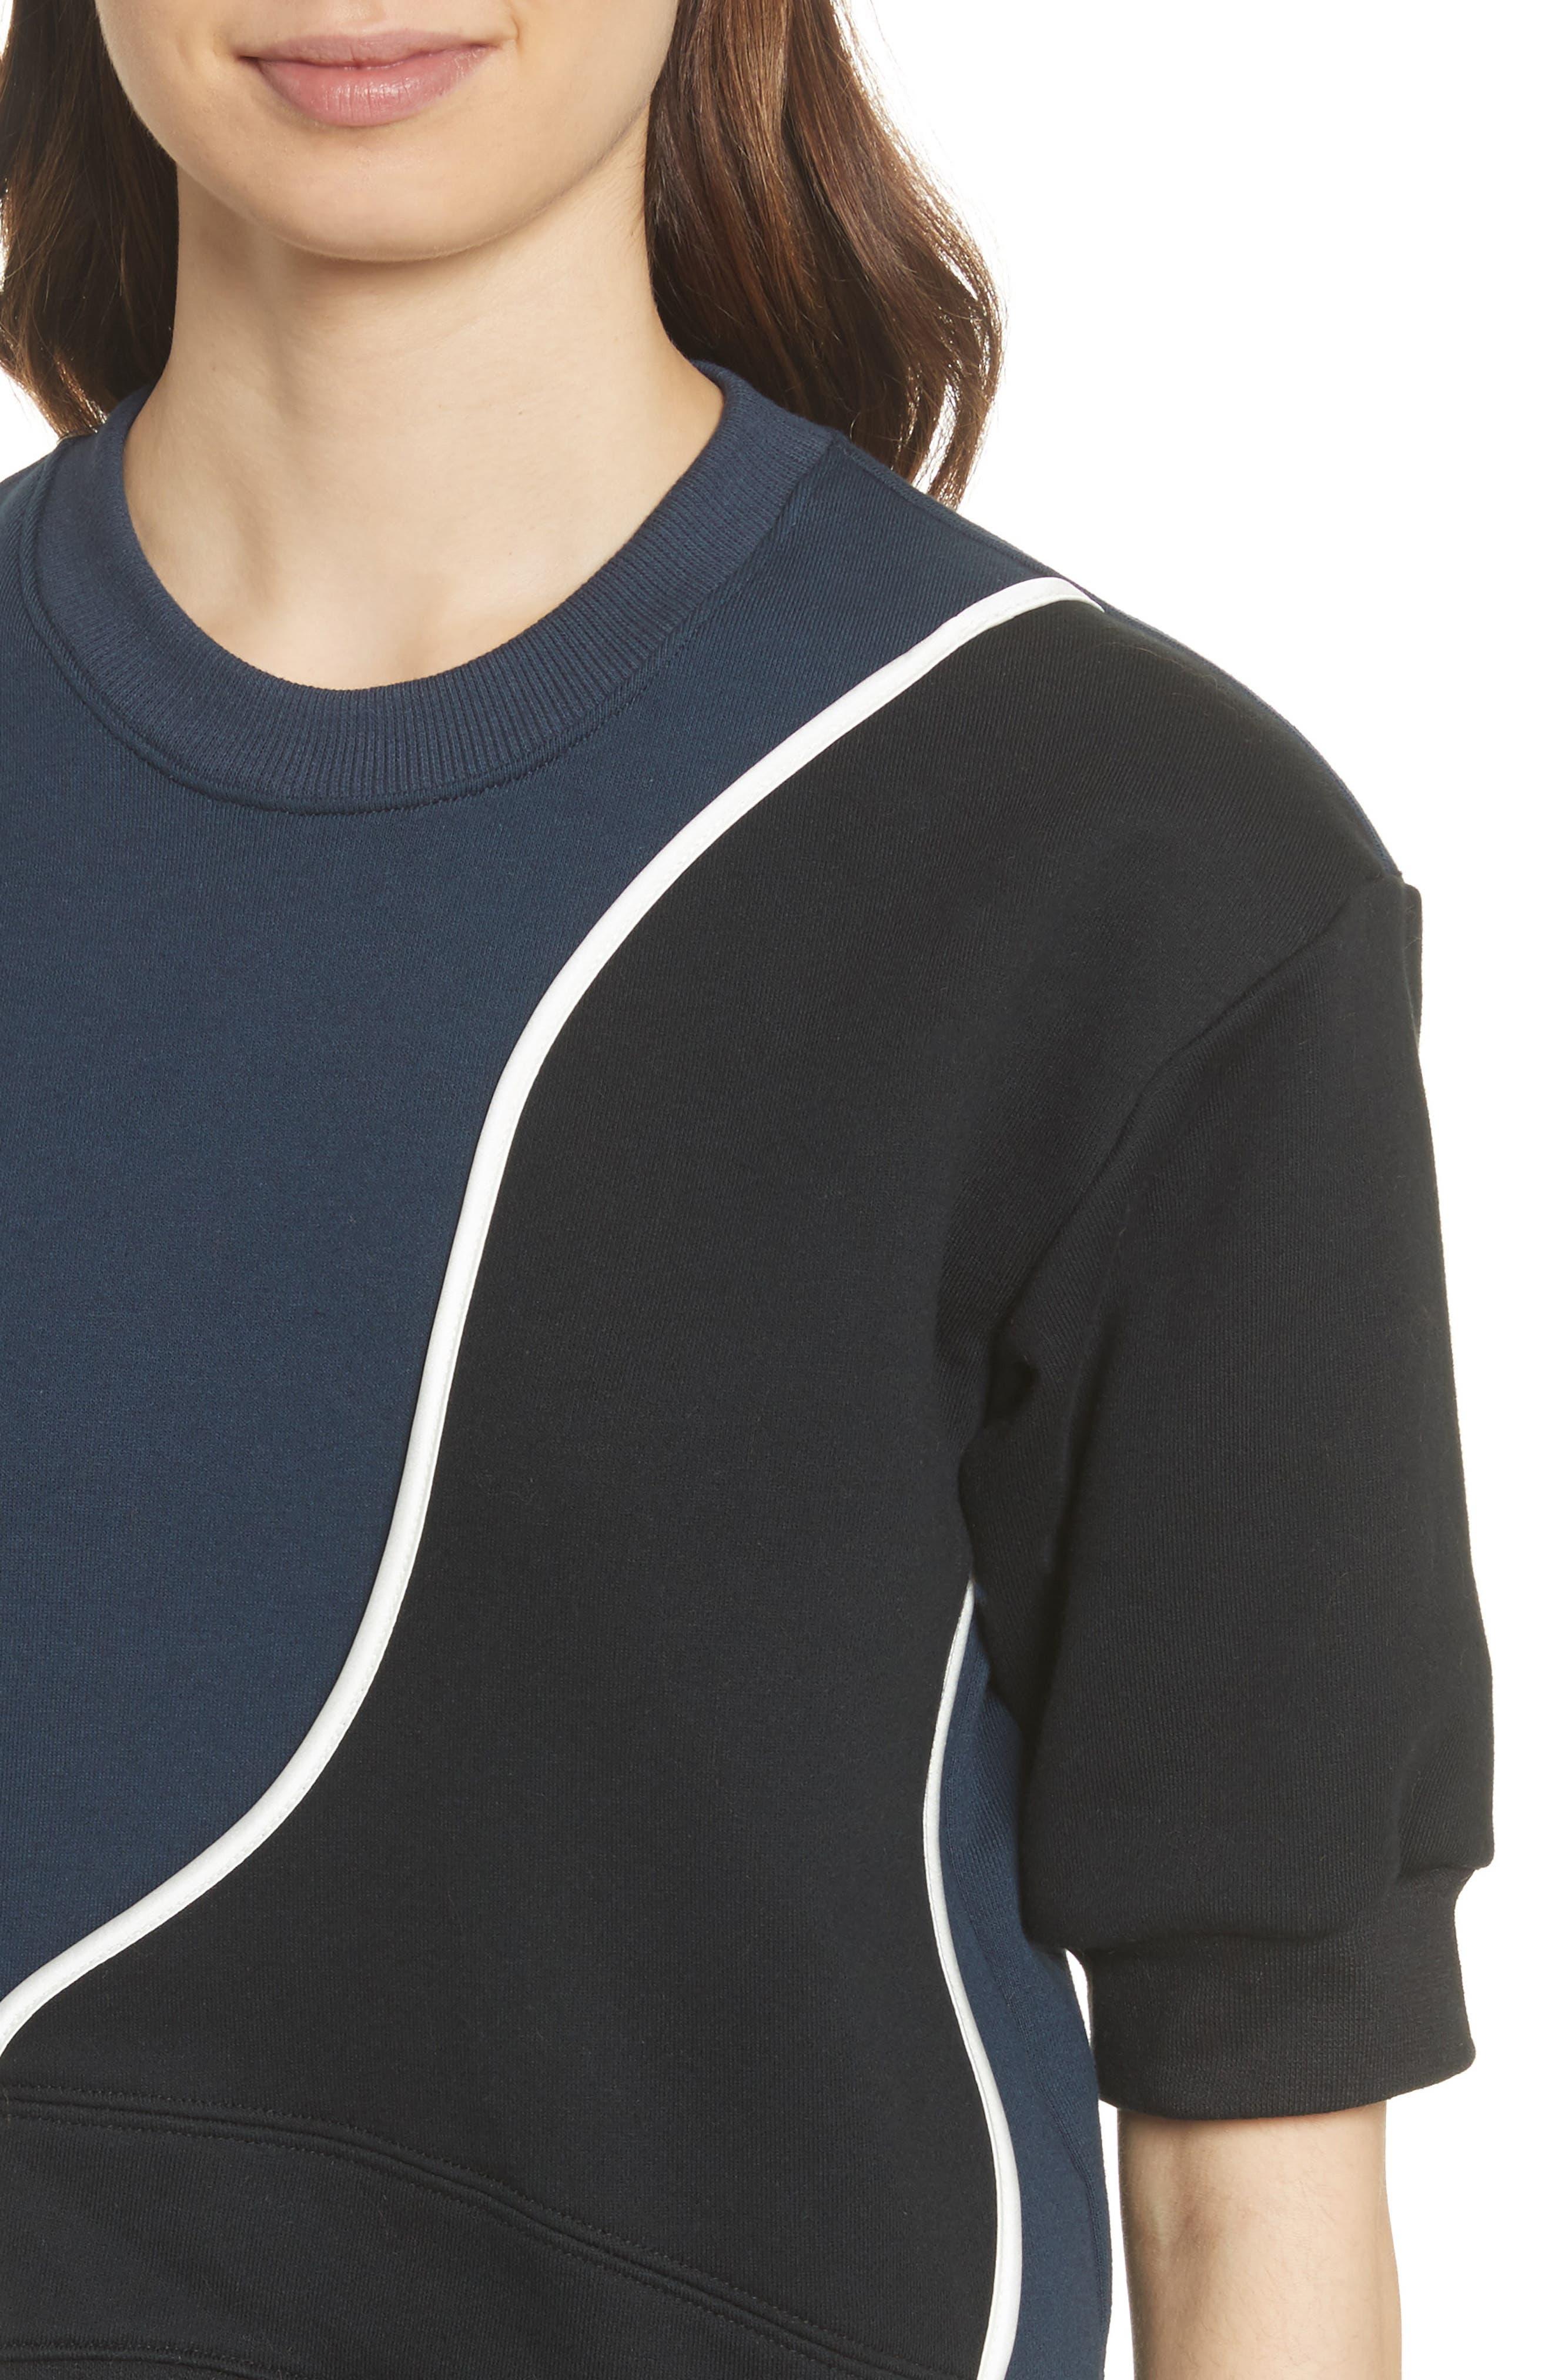 Roberto 03 Colorblock Sweatshirt,                             Alternate thumbnail 4, color,                             Navy